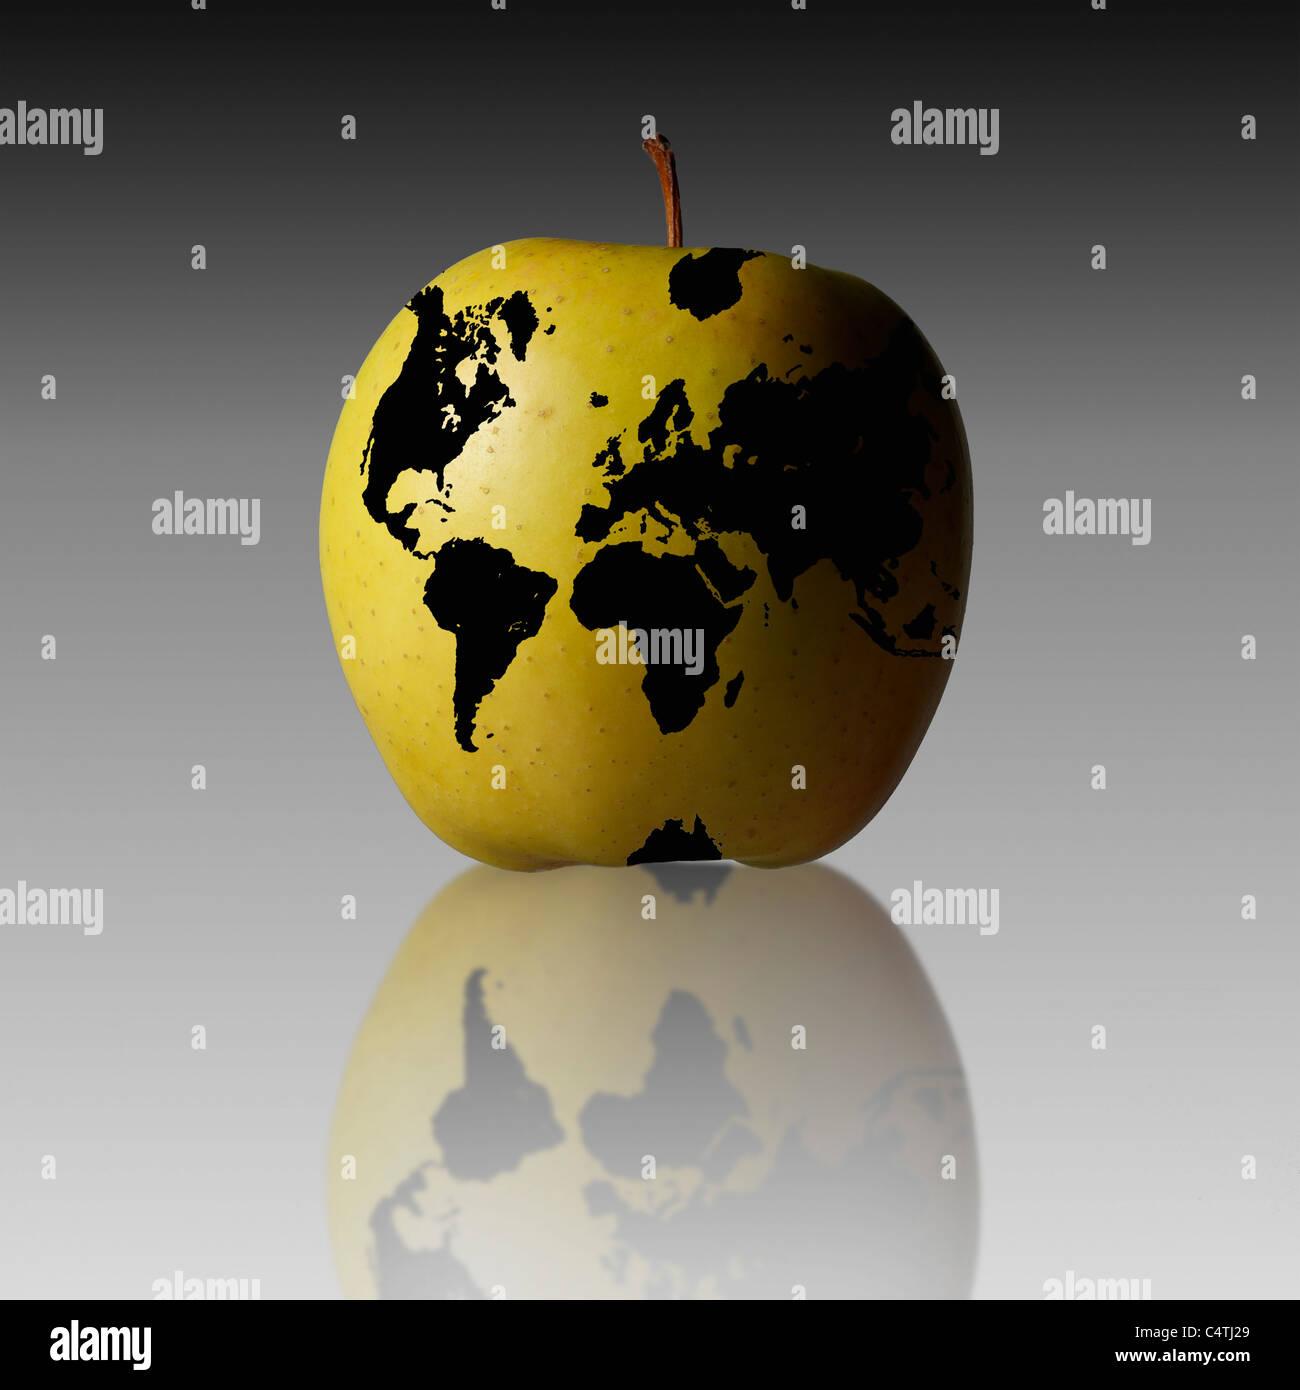 World map on apple stock photo royalty free image 37420385 alamy world map on apple gumiabroncs Choice Image